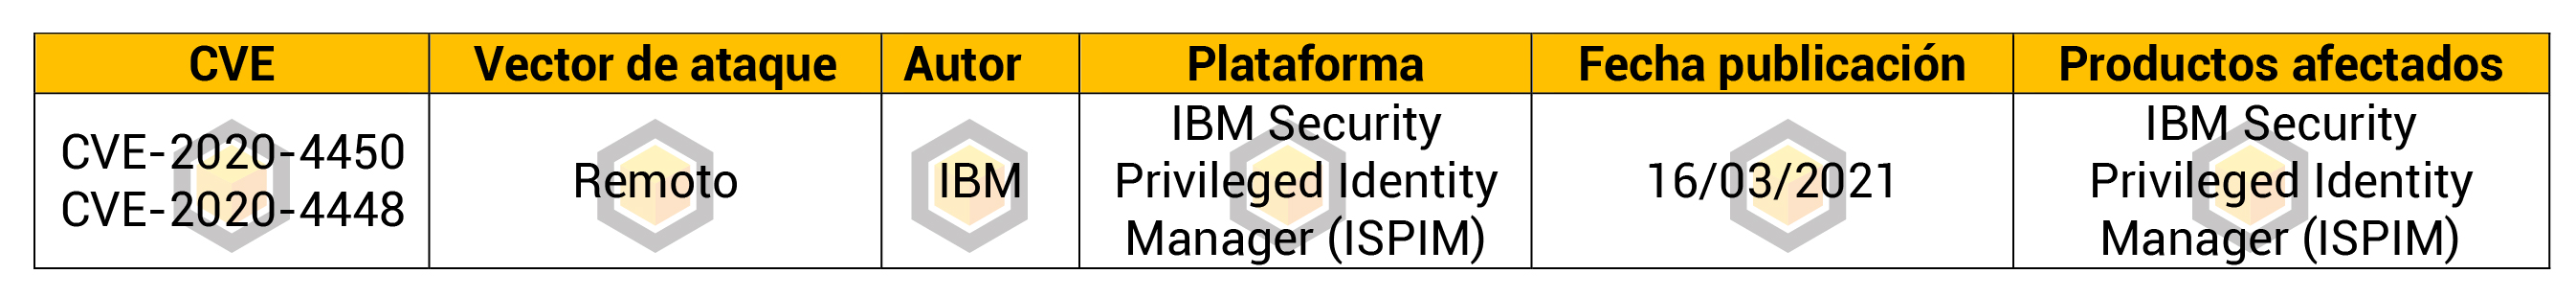 Múltiples vulnerabilidades en IBM Security Privileged Identity Manager (ISPIM)